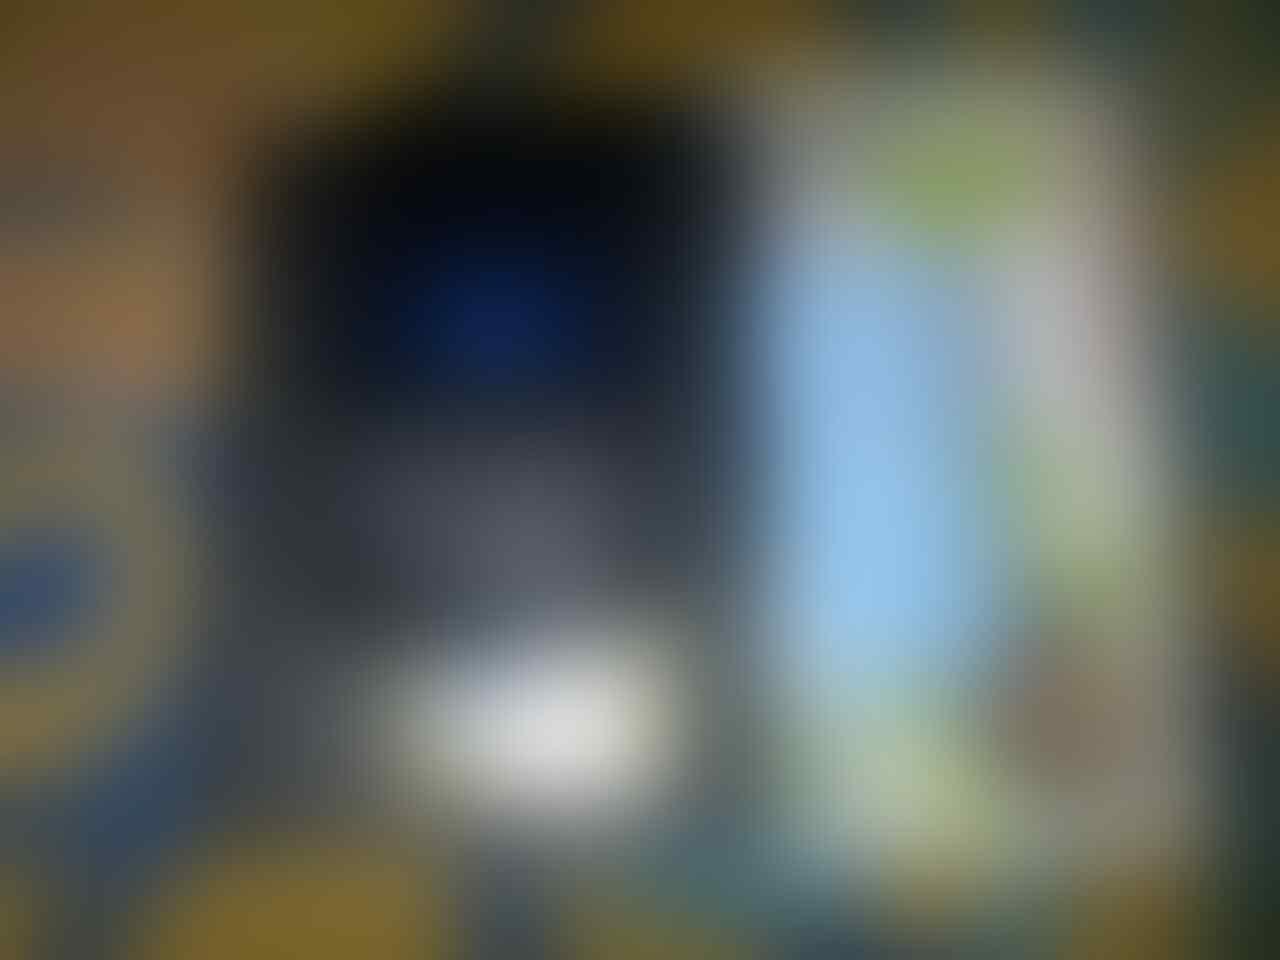 Blackberry Gemini 8520 + Power Bank